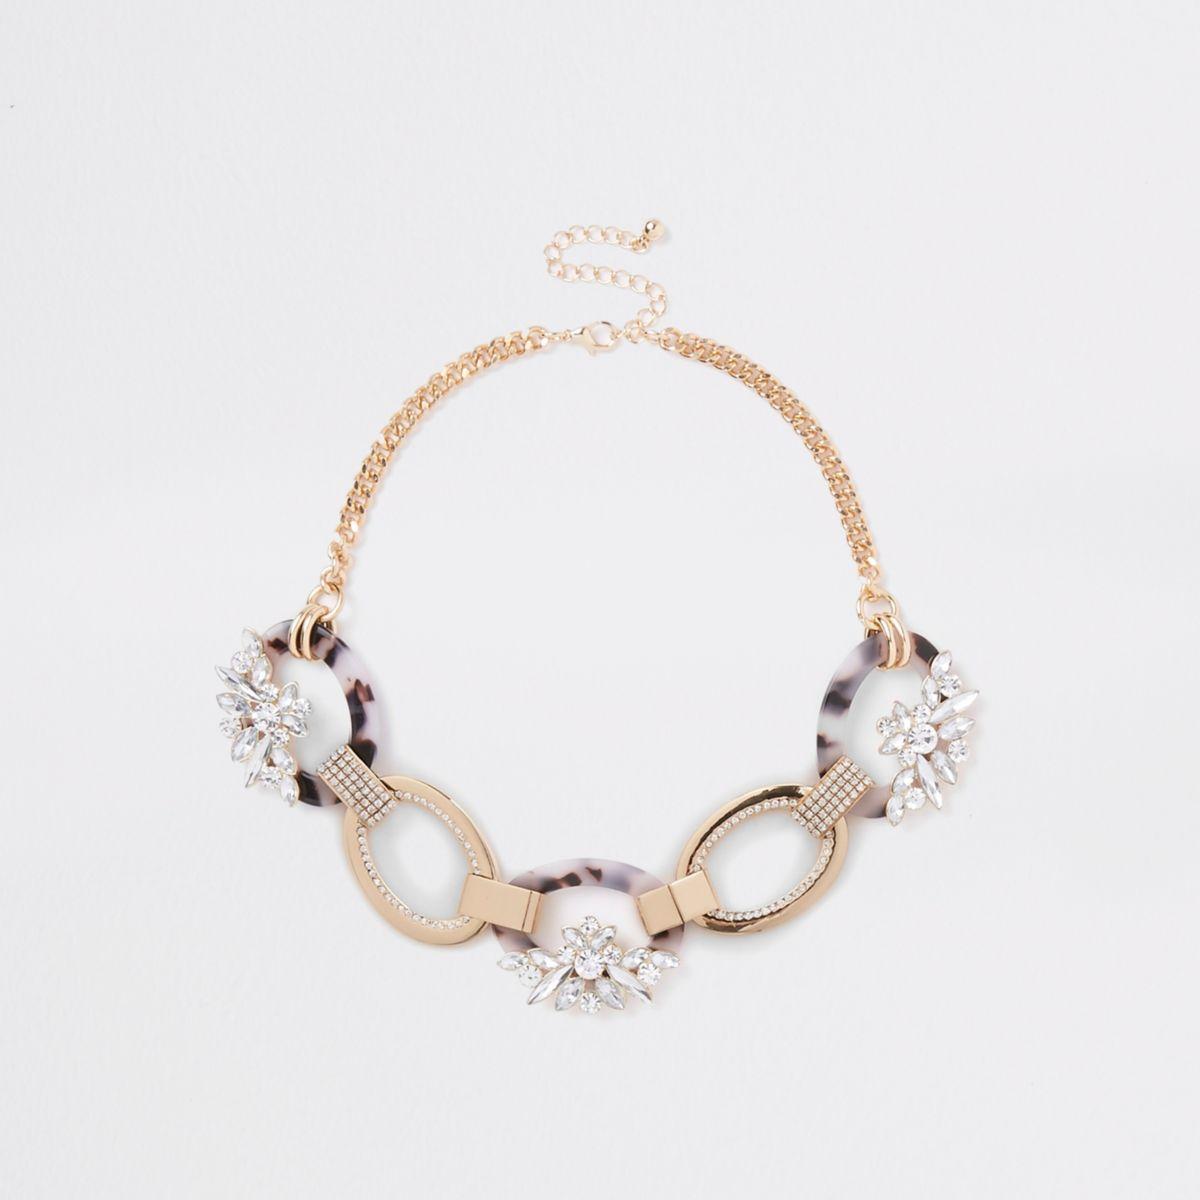 Gold tone oval interlinked rhinestone necklace